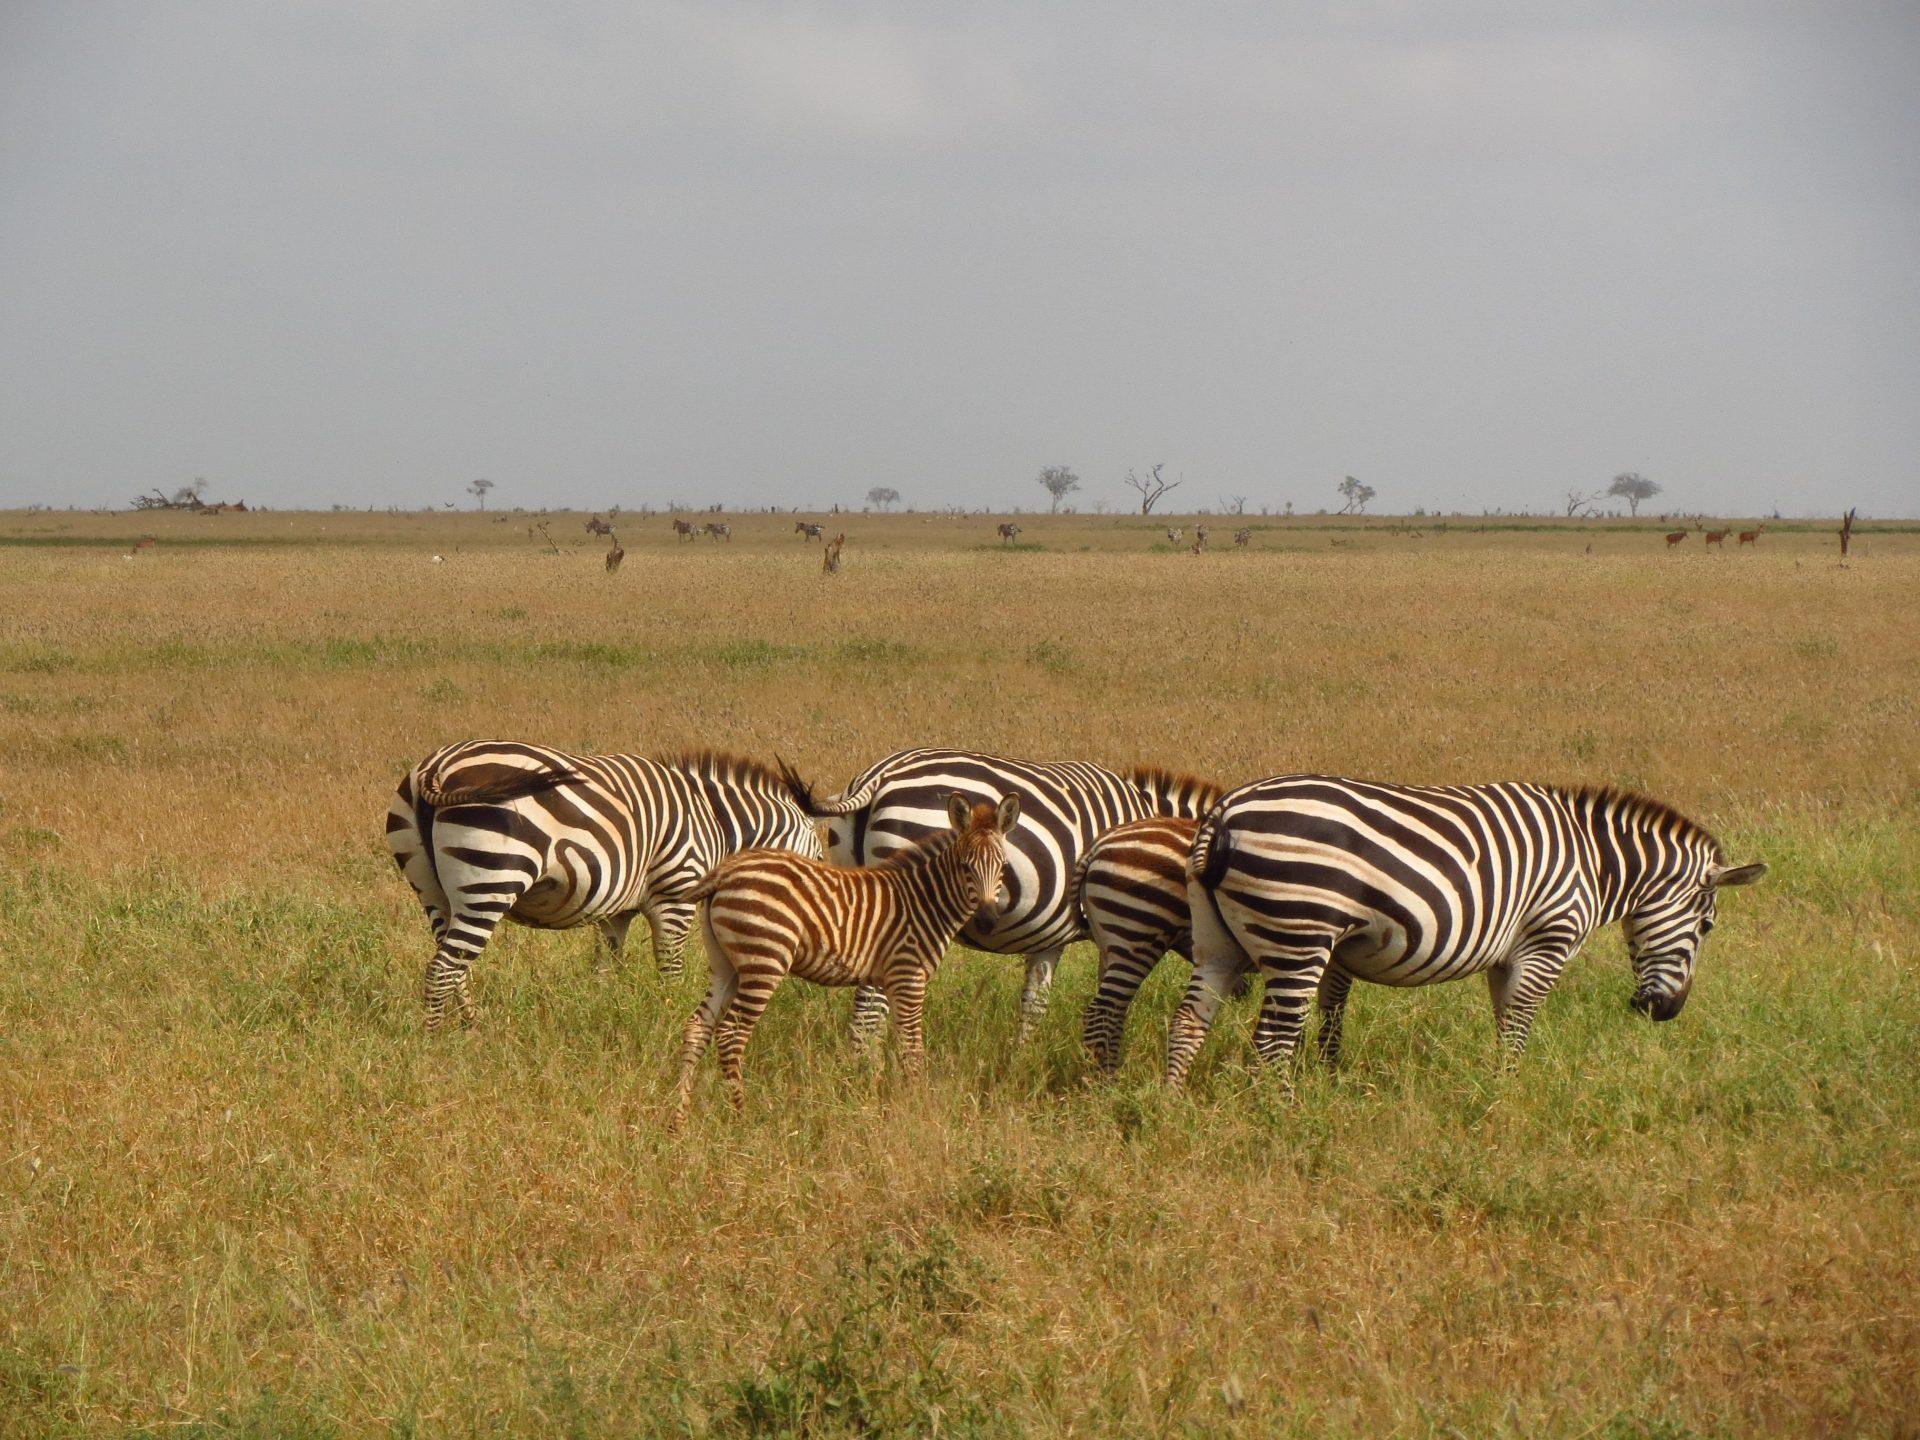 Safari v nacionalnem parku Tsavo east